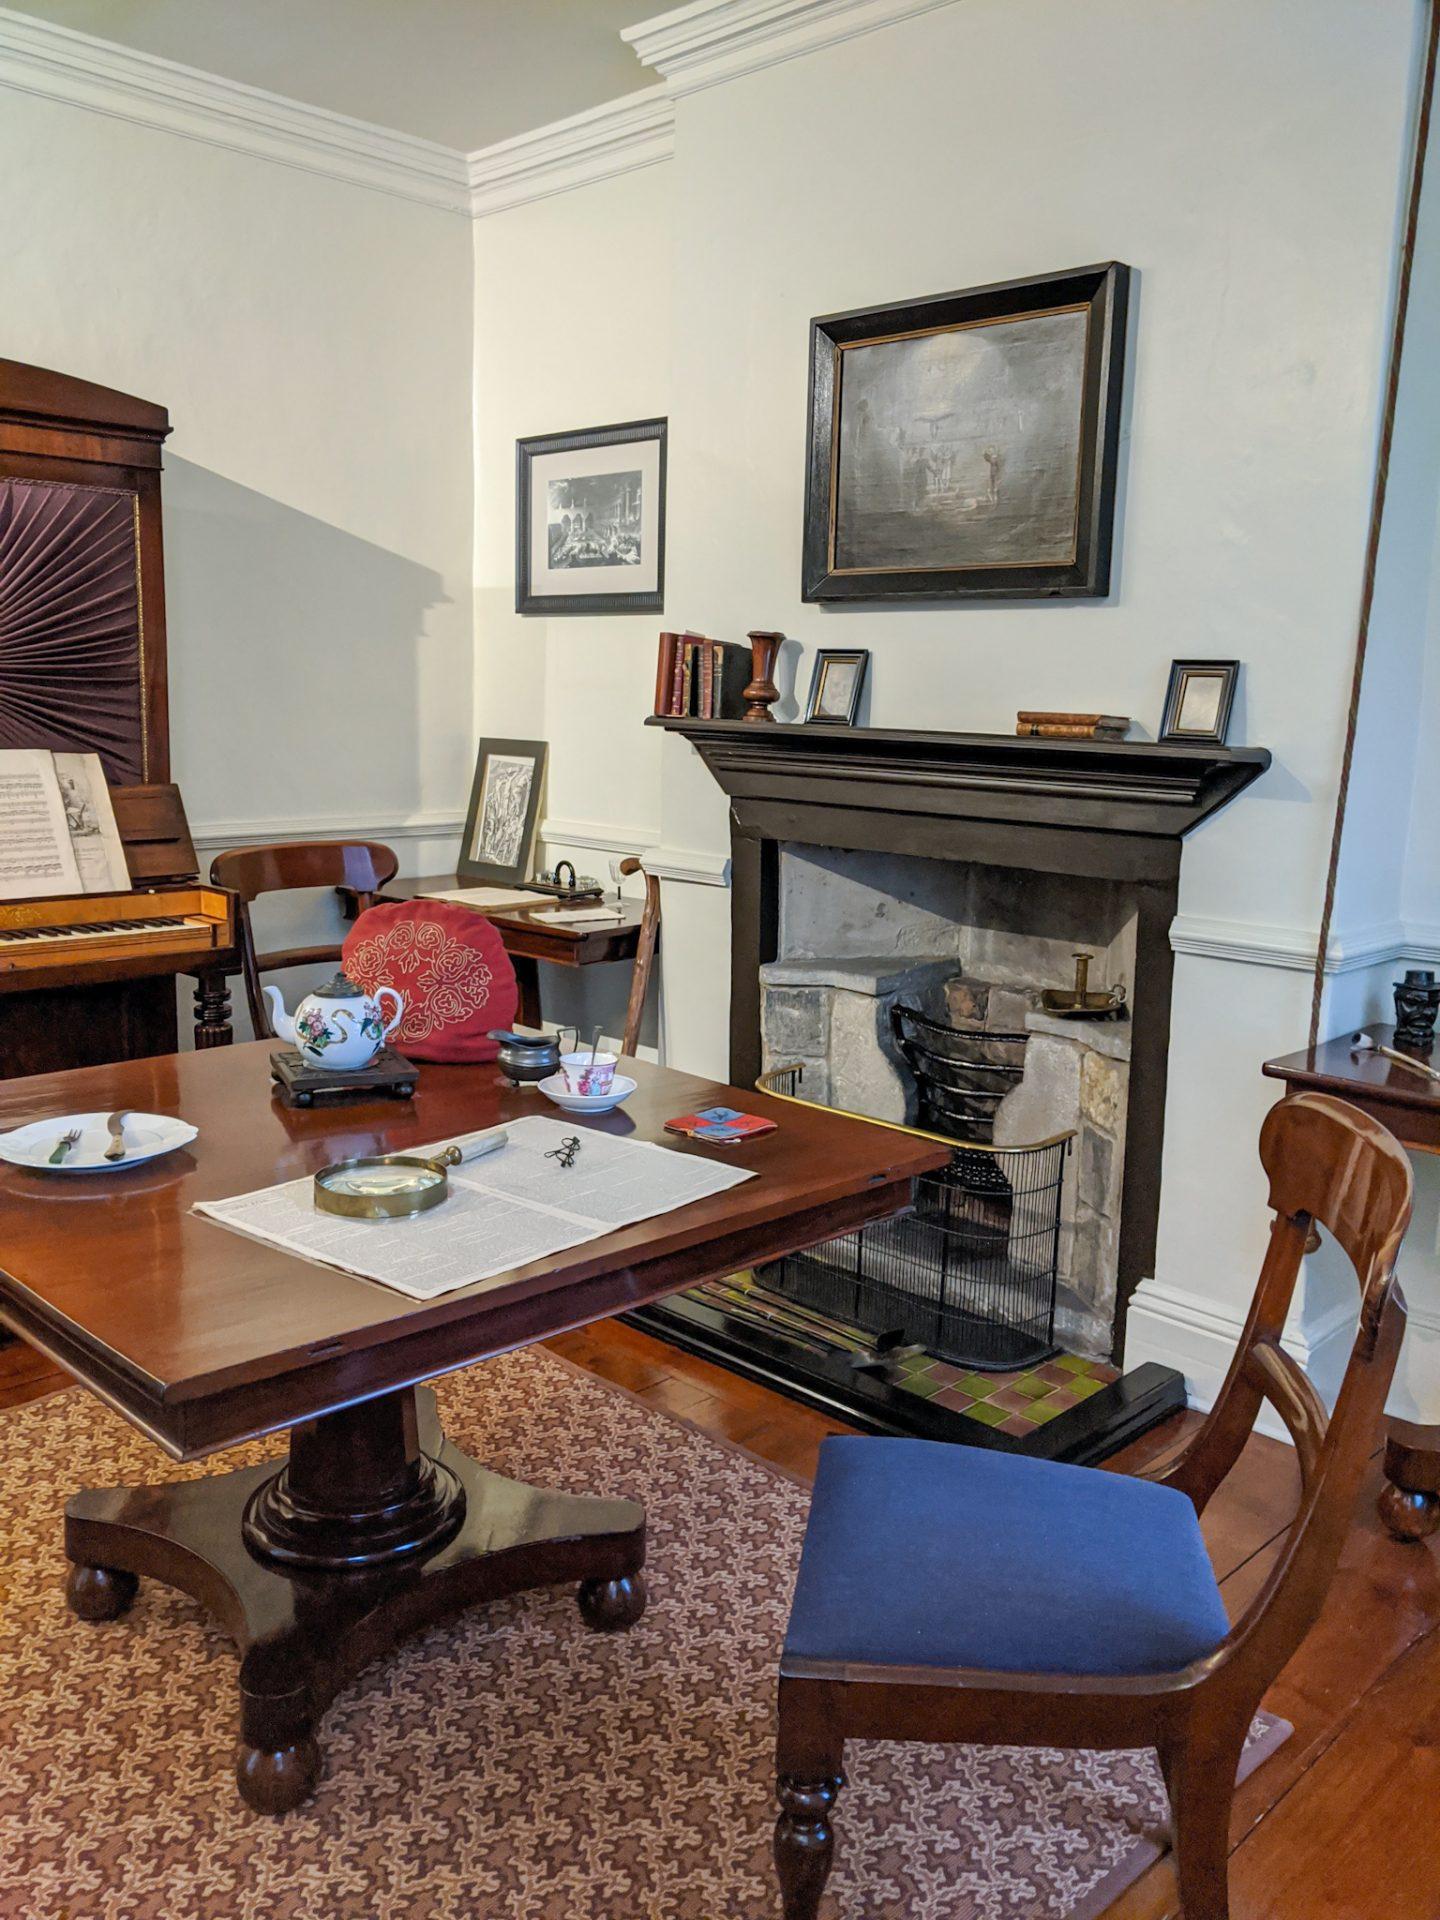 Mr Brontë's Study at the Parsonage Museum